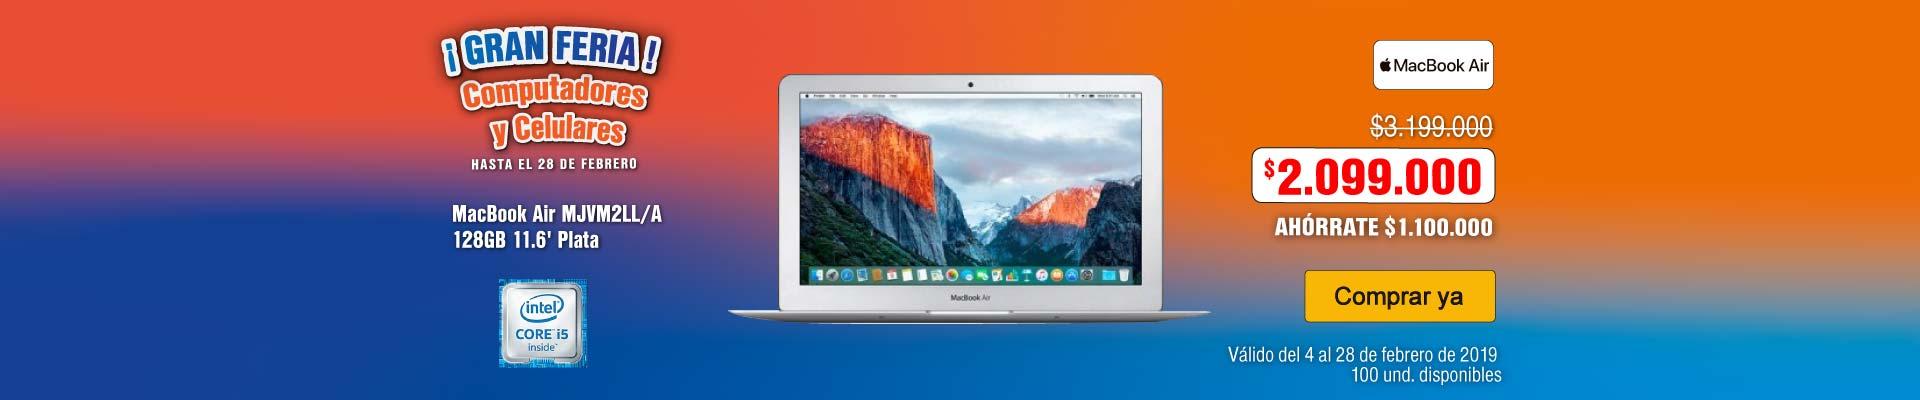 AK-PPAL-1-computadores y tablets-PP---MacBook Air 11' 128GB_feb20GC